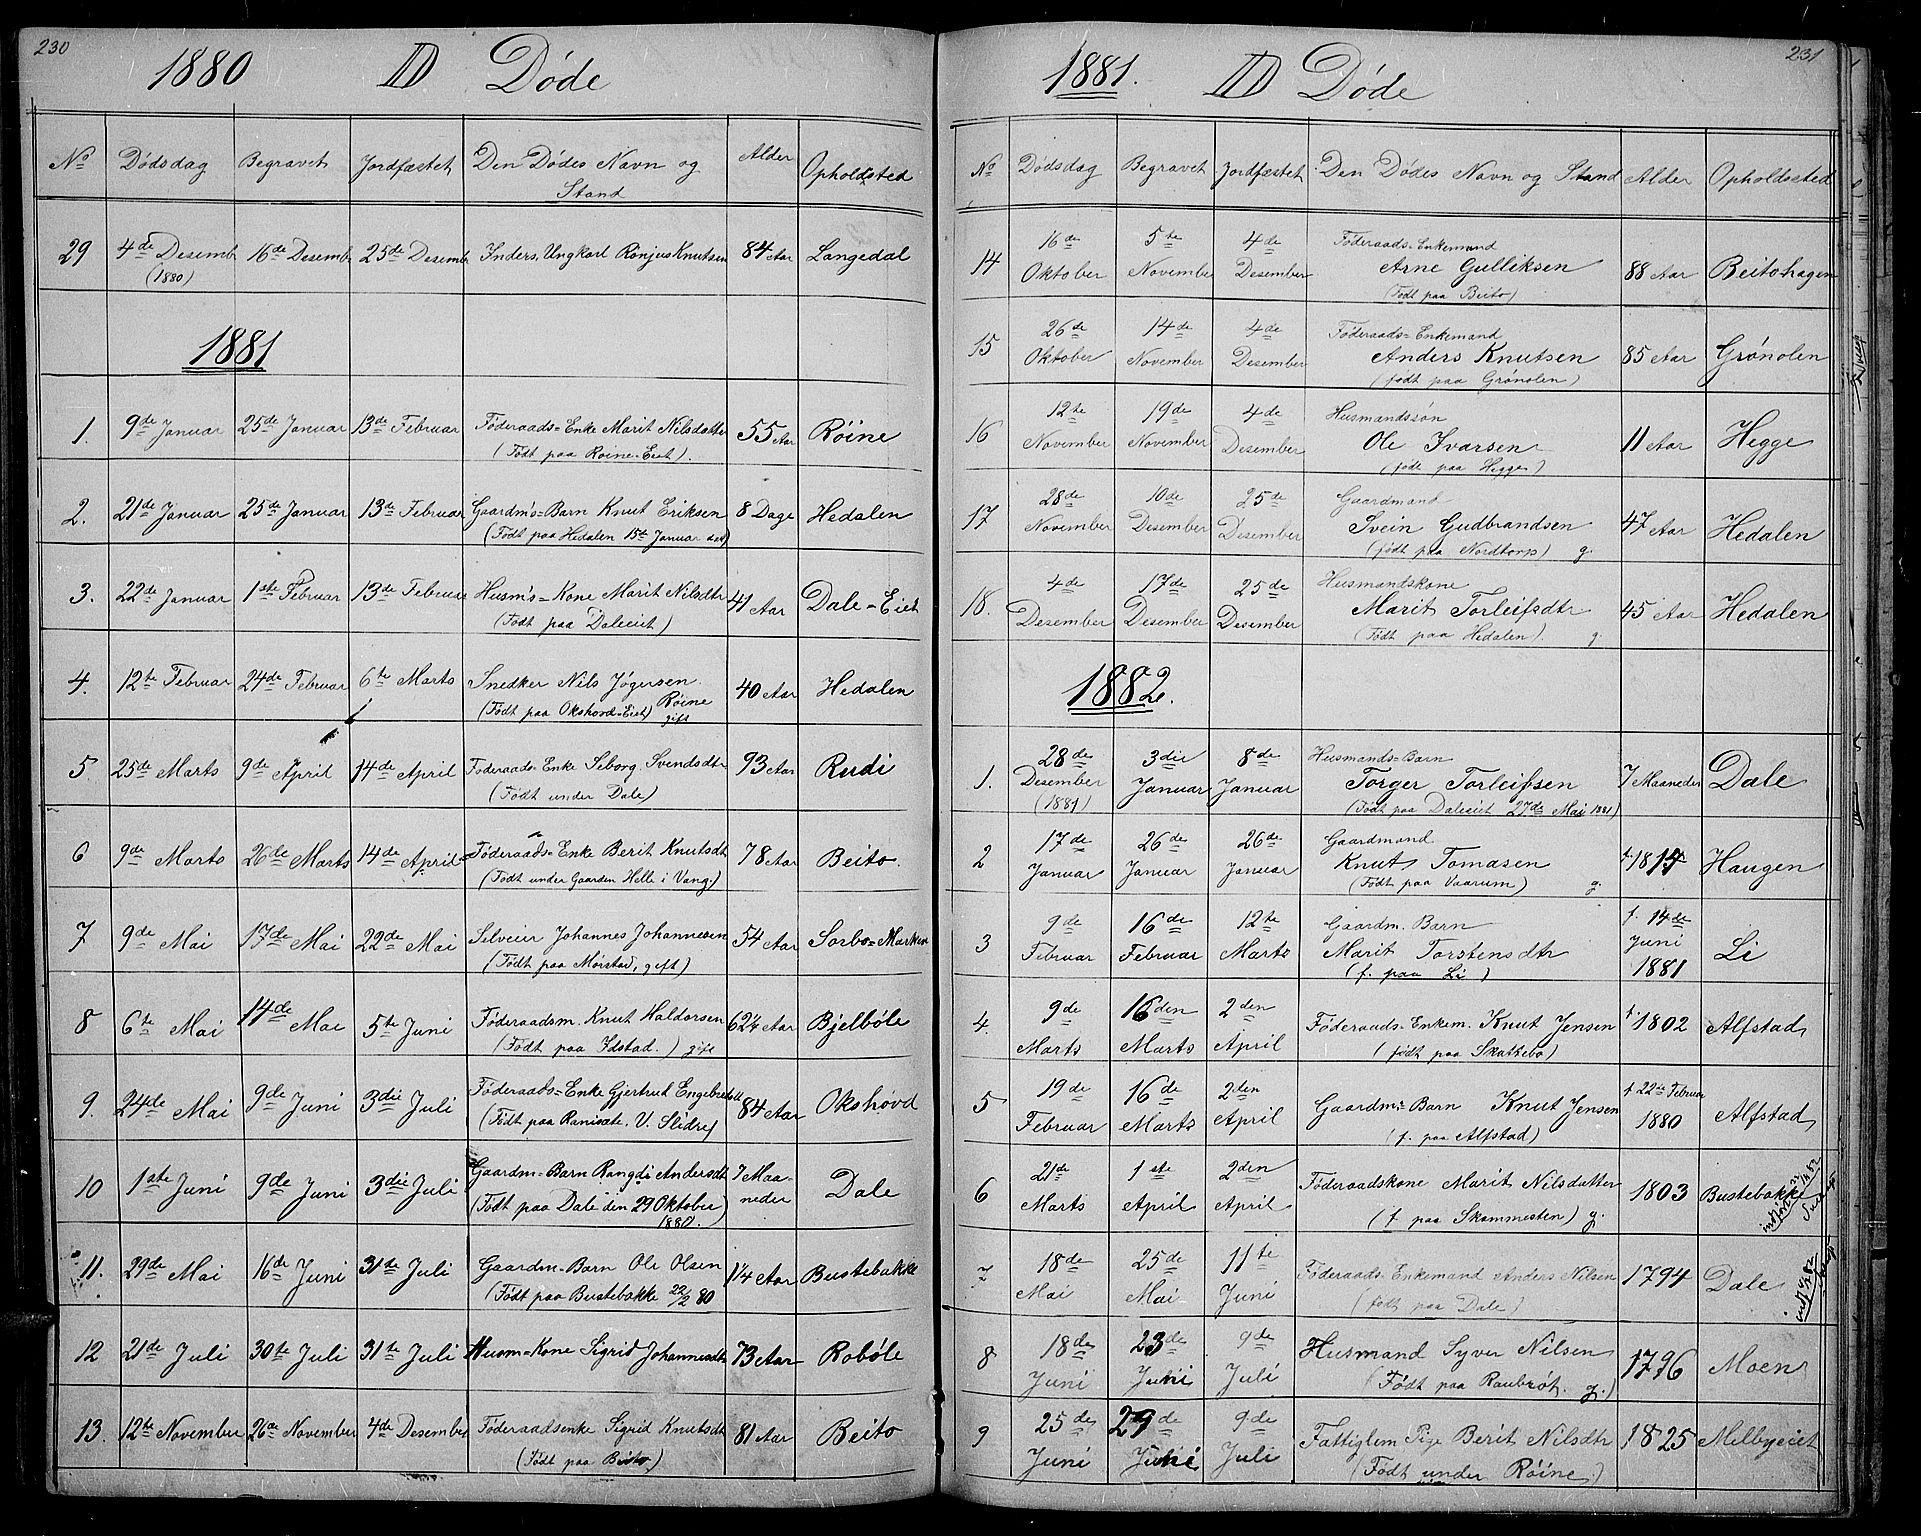 SAH, Øystre Slidre prestekontor, Klokkerbok nr. 1, 1866-1886, s. 230-231